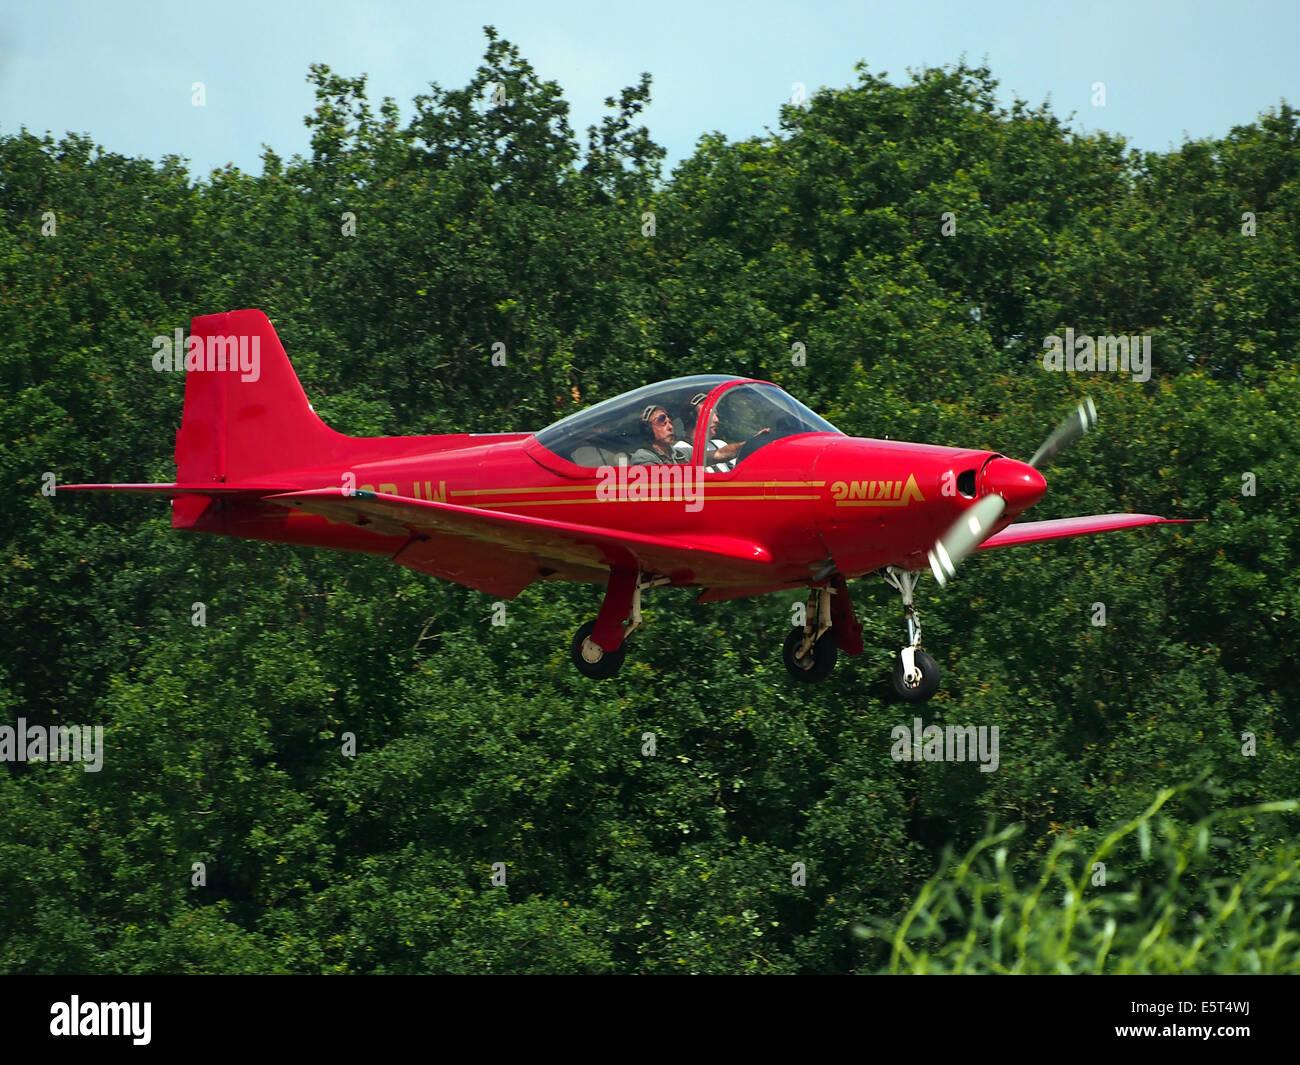 G-ORJW Laverda F8L Falco IV , landing at Hilversum Airport (ICAO EHHV), photo2 - Stock Image